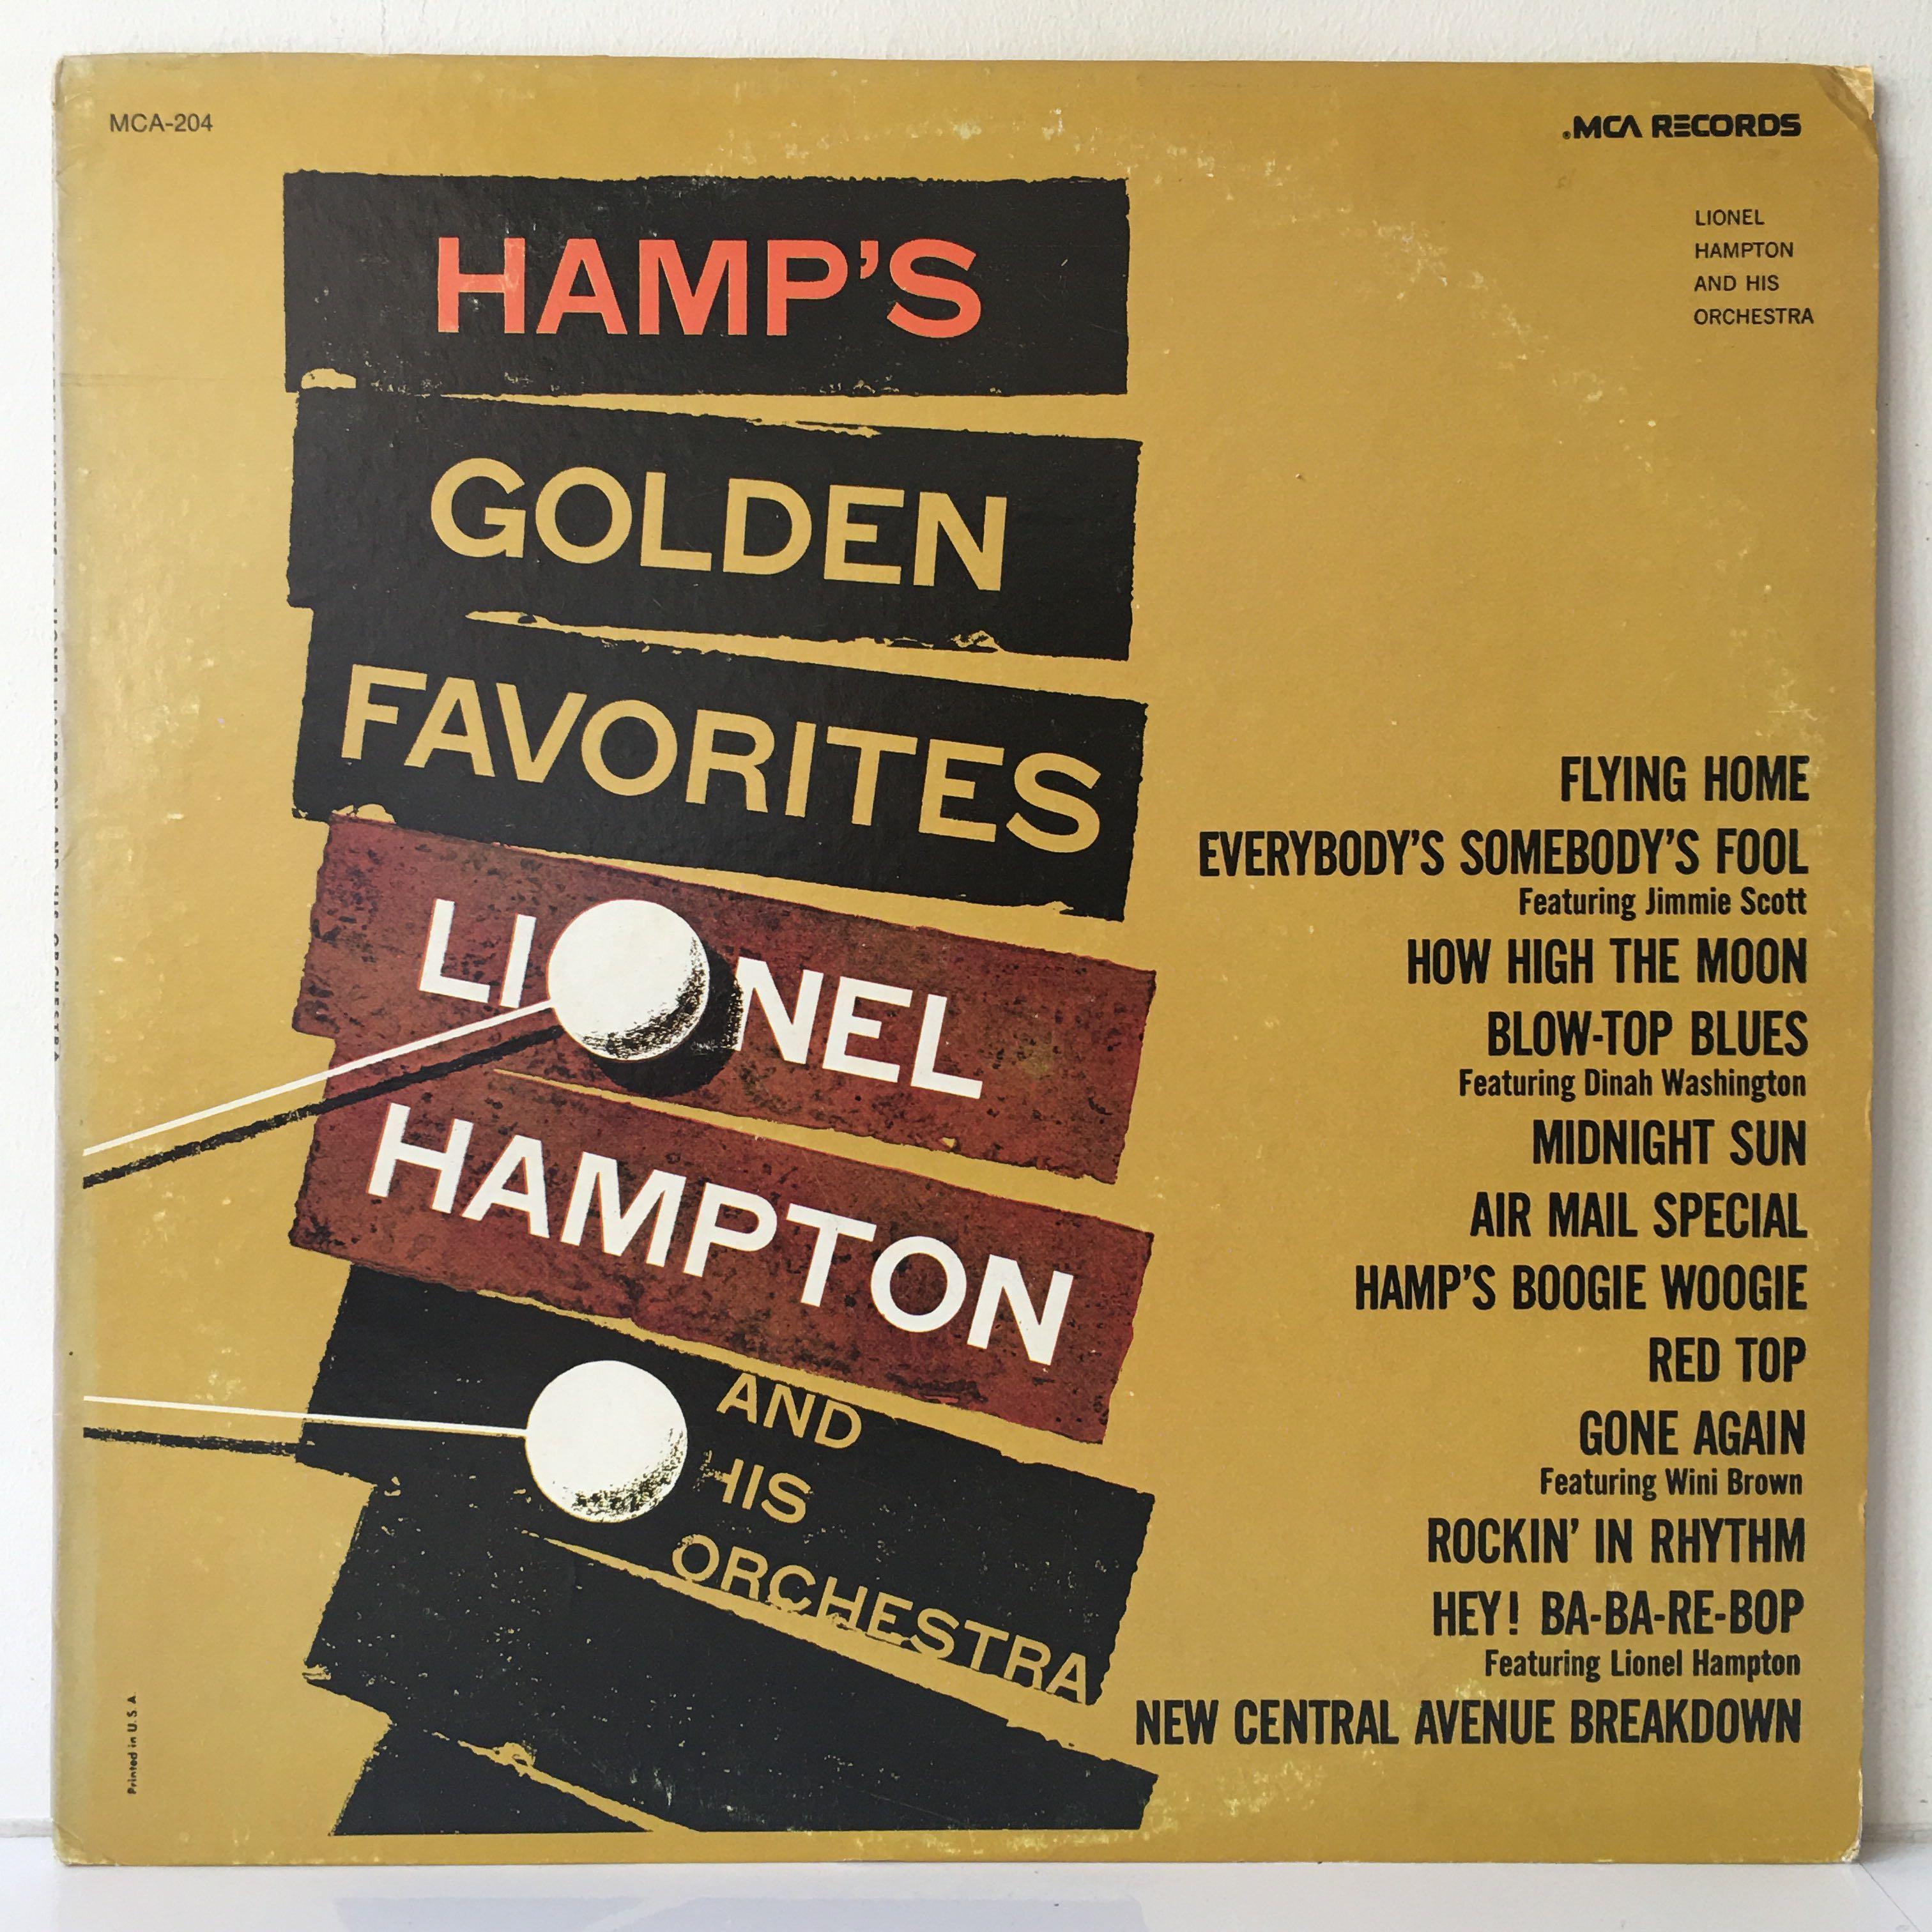 Lionel Hampton And His Orchestra – Hamp's Golden Favorites (1980 US Pressing - Vinyl is Excellent)